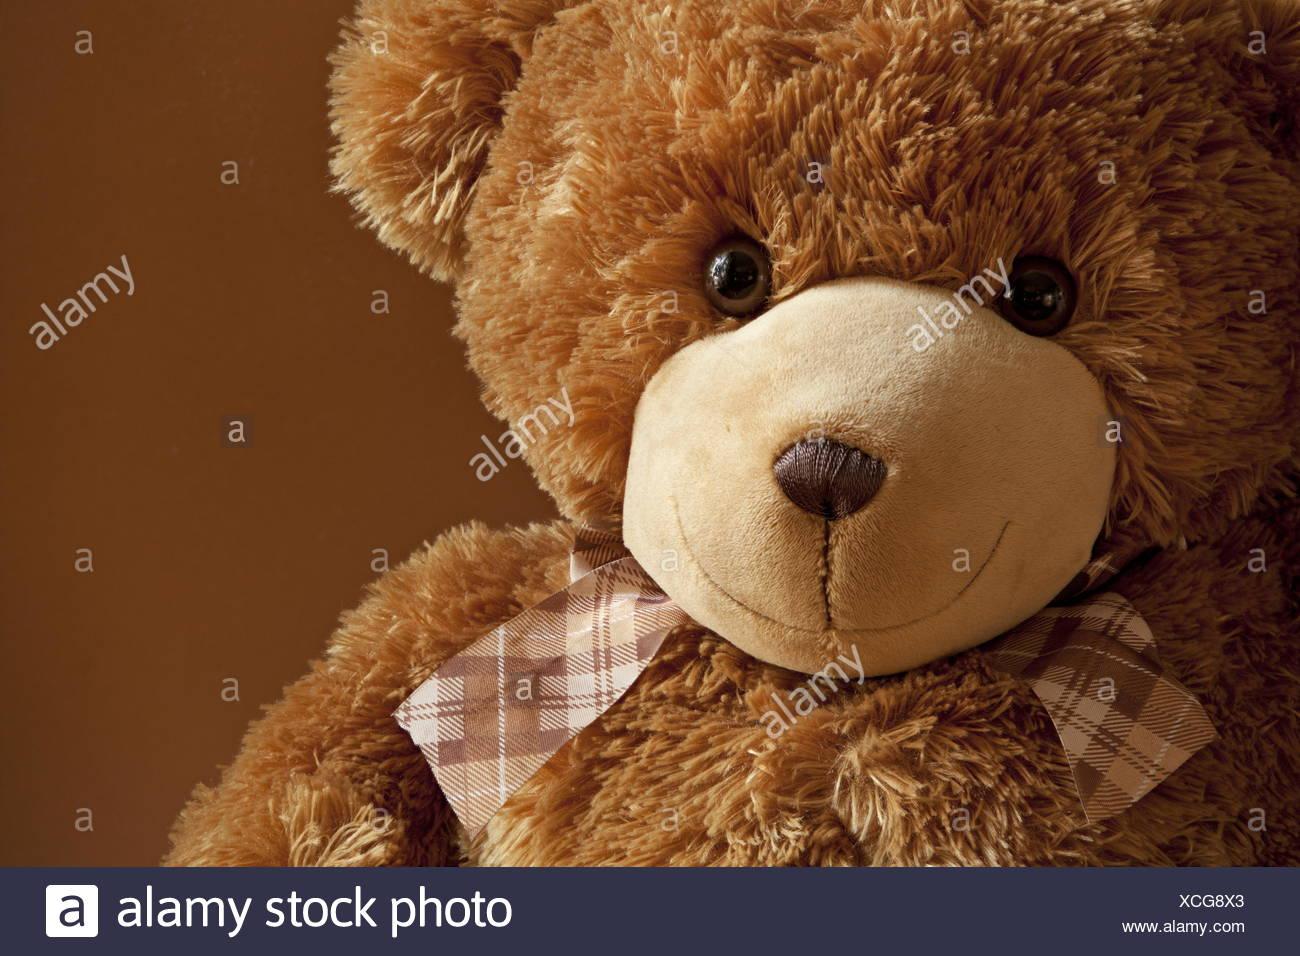 Kind friend plush teddy bear - Stock Image